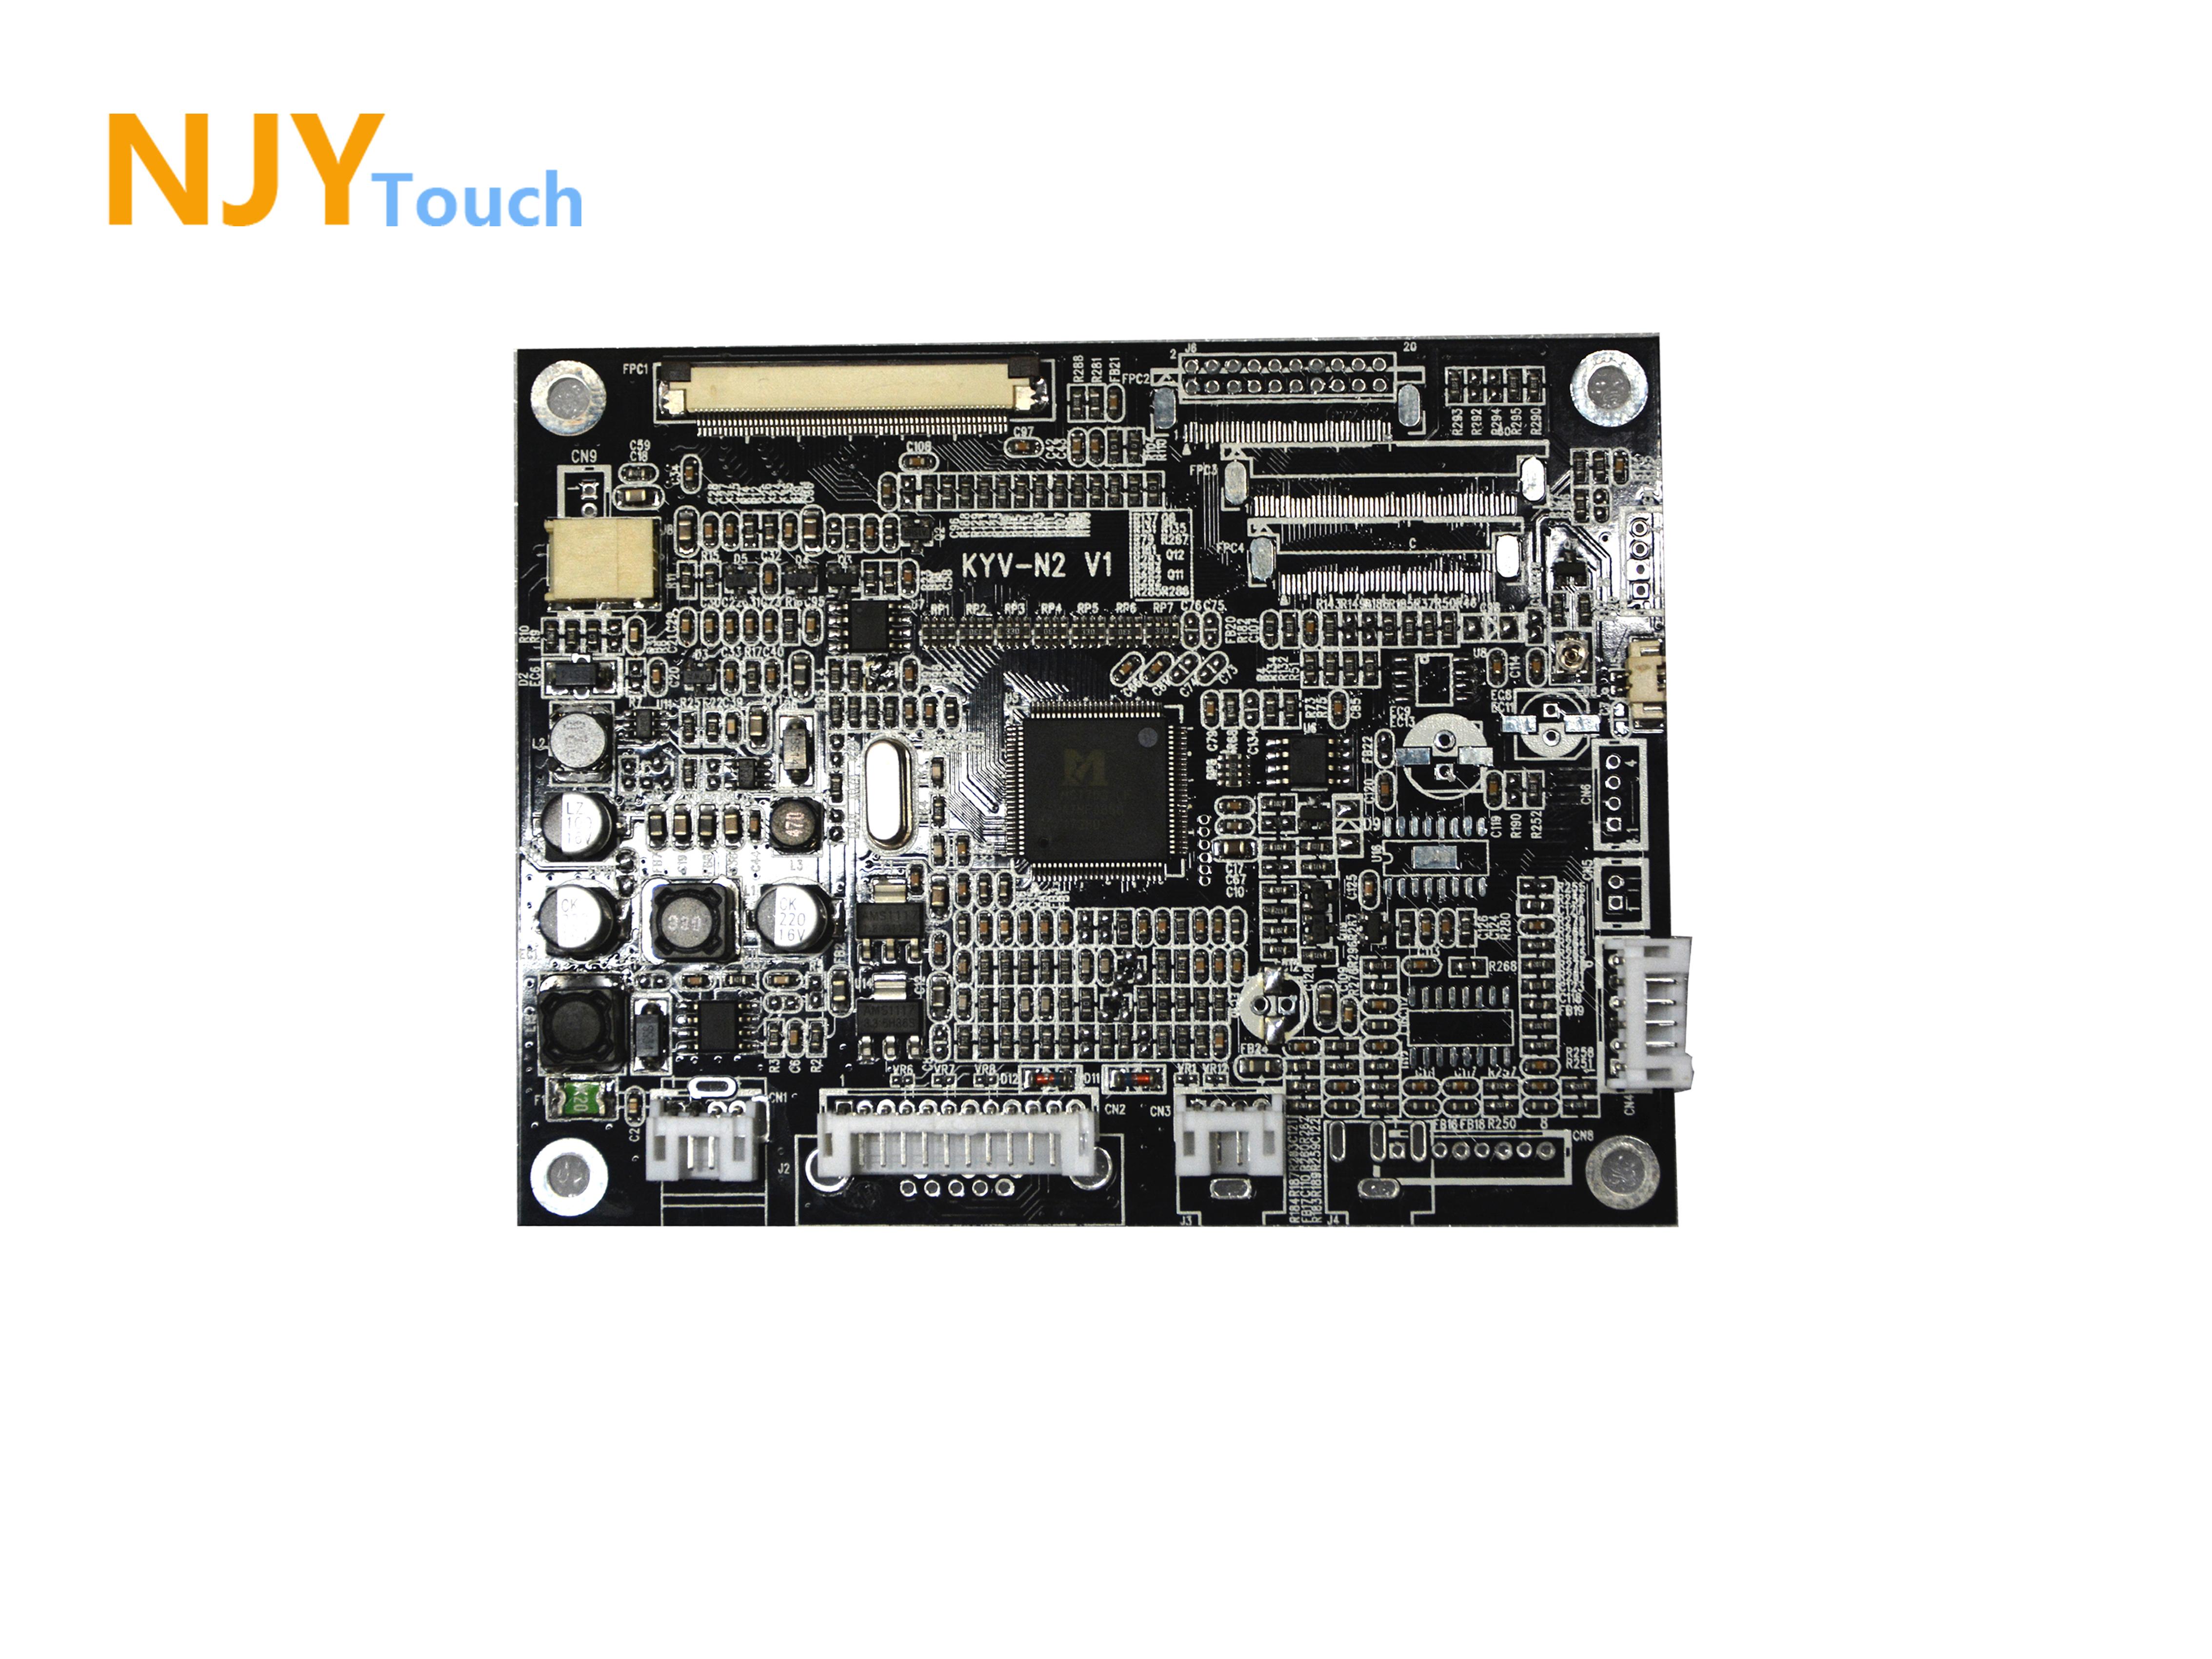 NJYTouch KYV-N2 V1 VGA AV LCD Controller Board For 10.4inch A104SN03 V1 800x600 LCD Screen